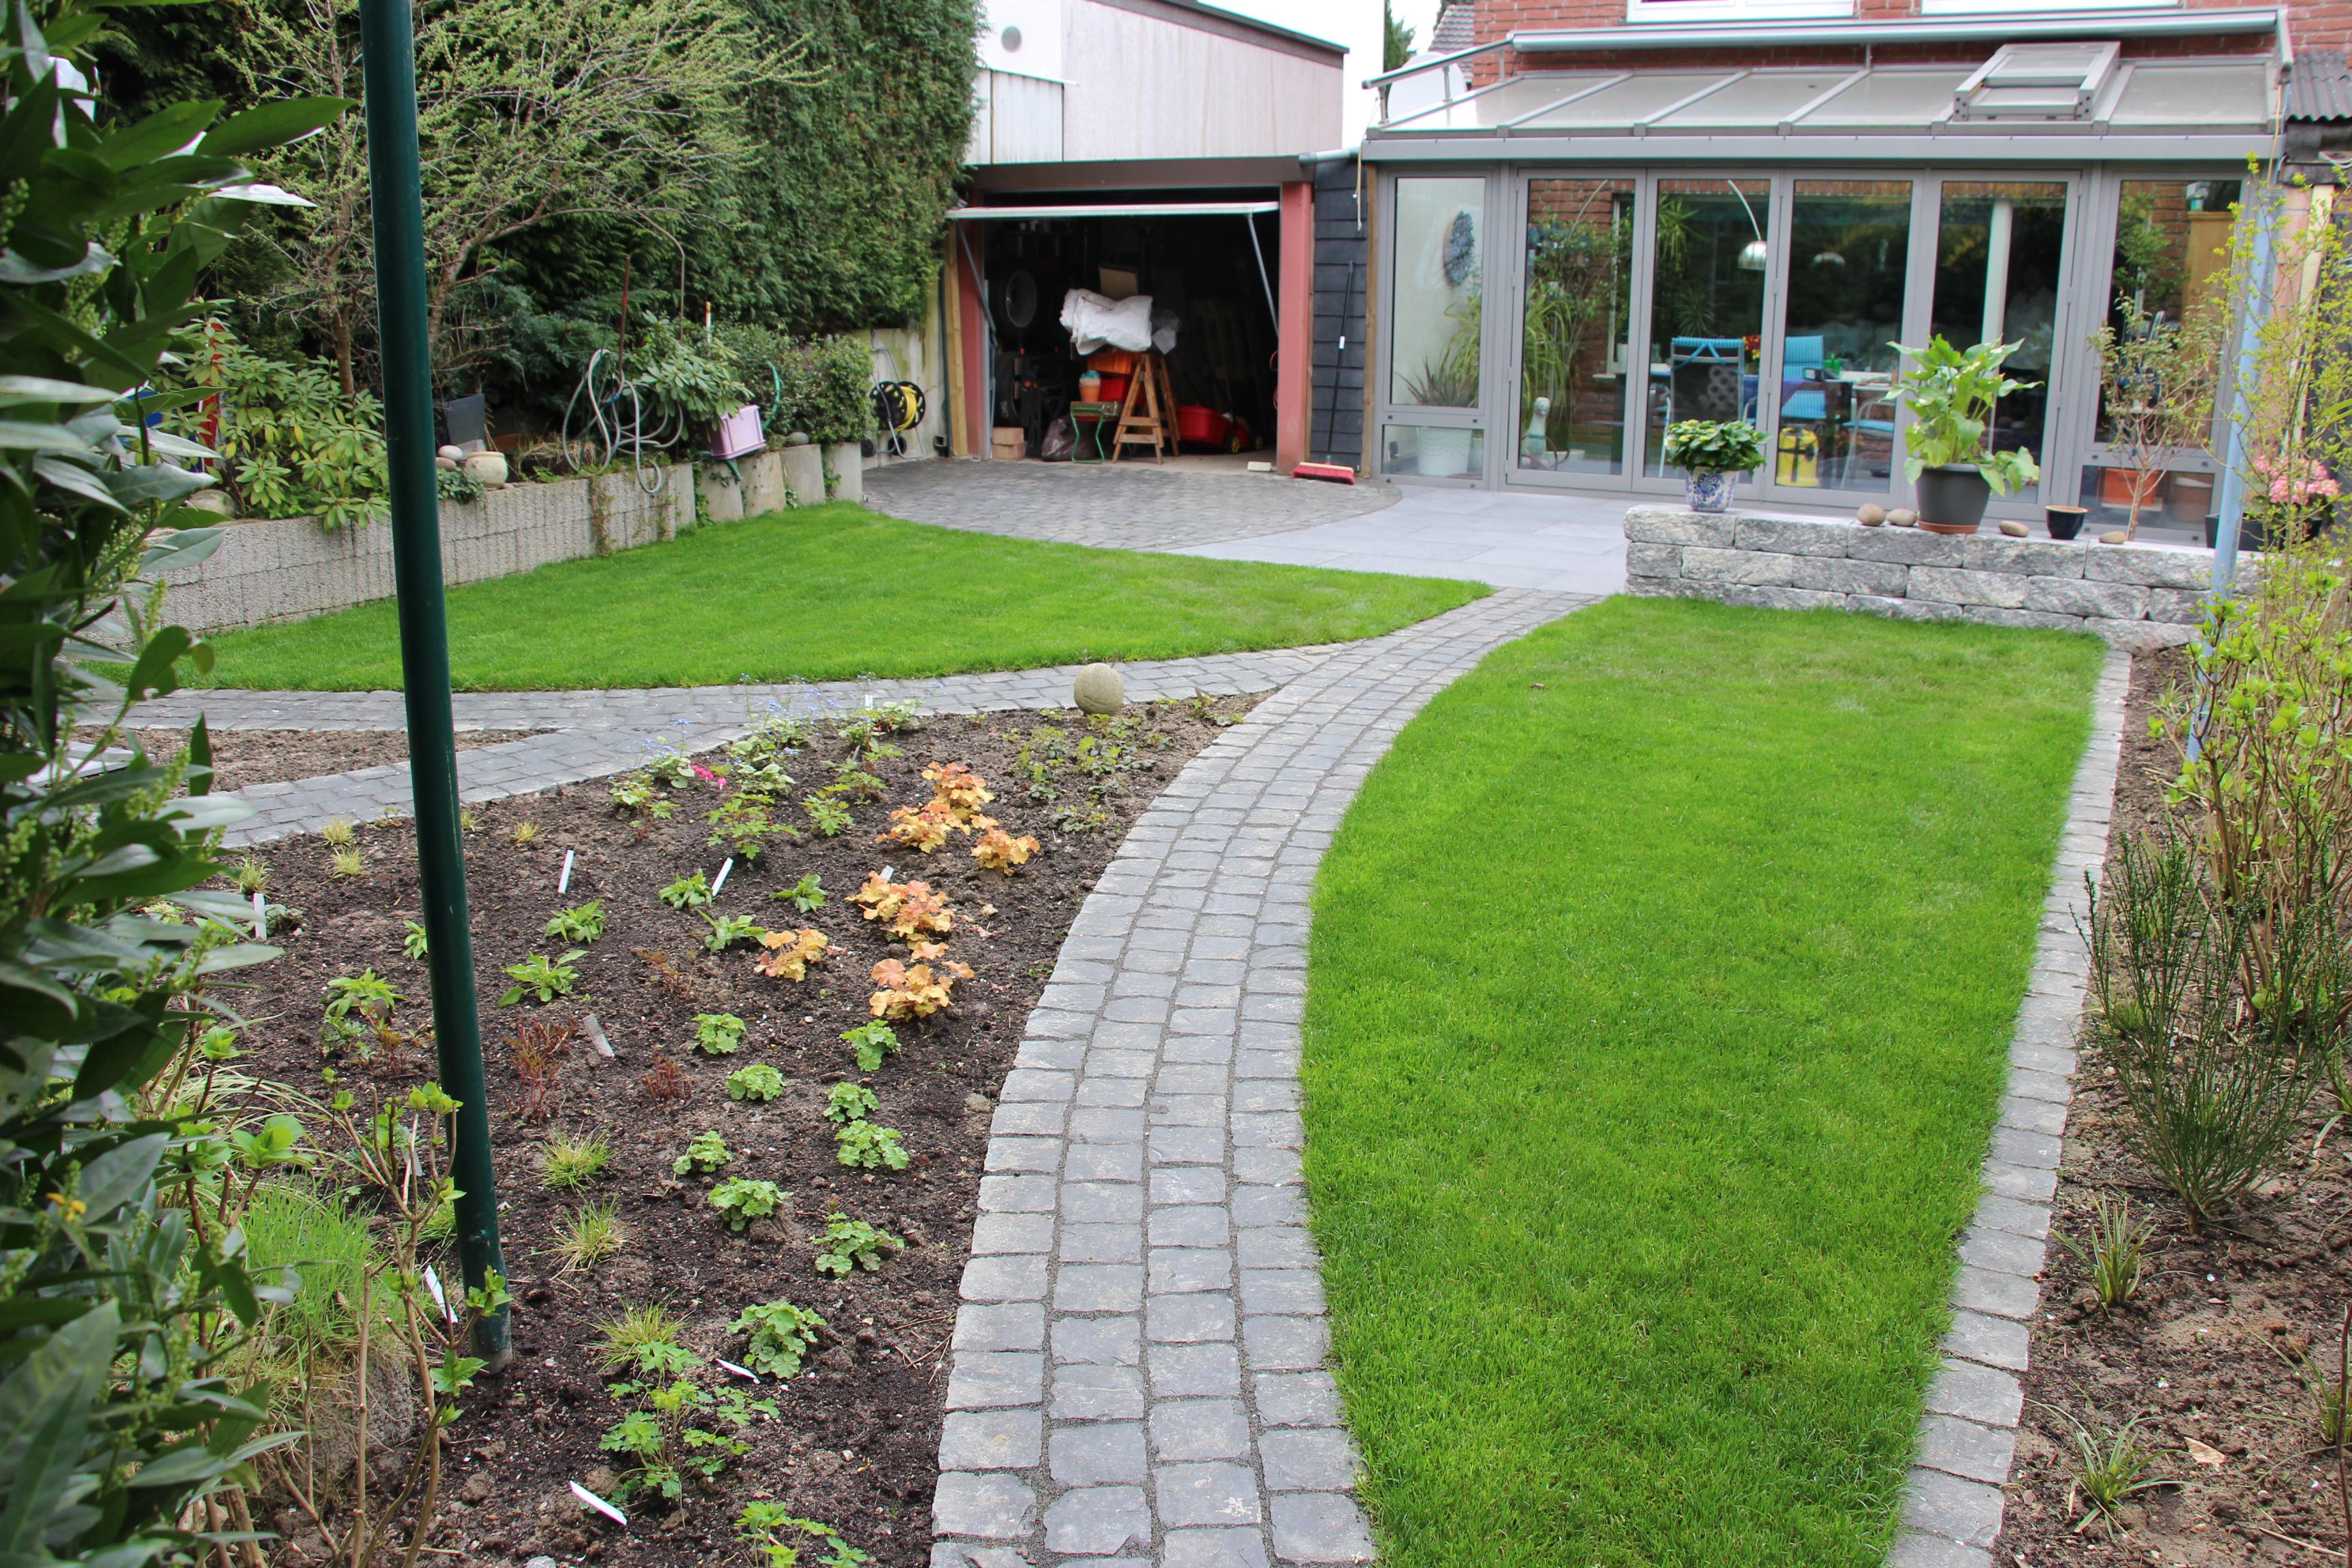 Gartenumgestaltung in bochum andreas hanik garten und landschaftsbau - Garten und landschaftsbau bochum ...